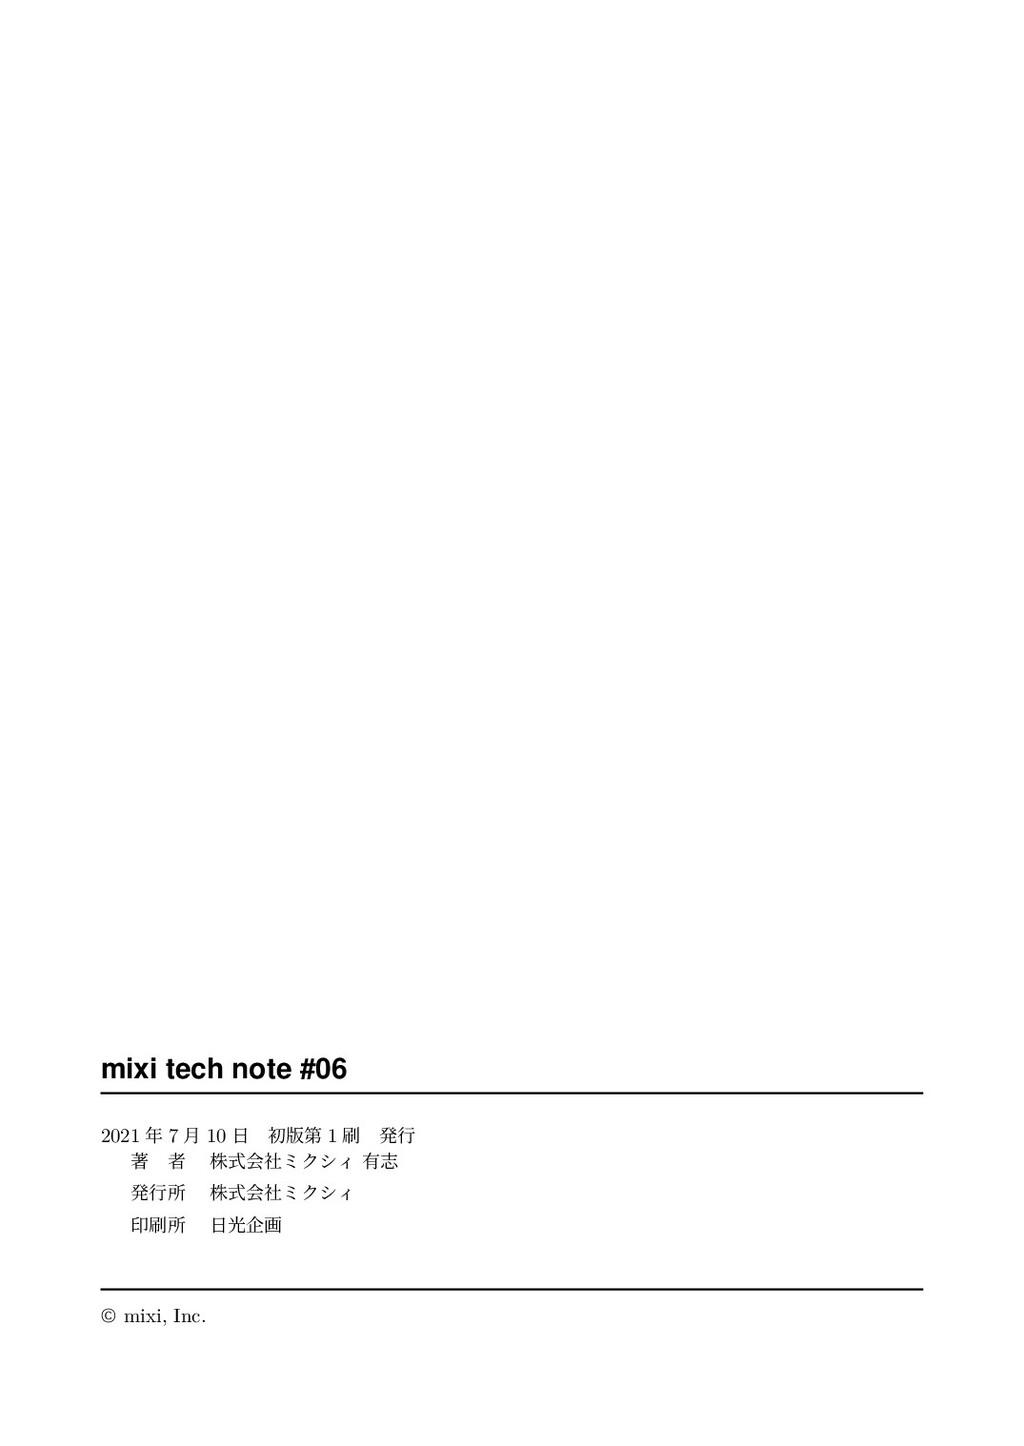 mixi tech note #06 2021  7 ݄ 10 ɹॳ൛ୈ 1 ɹൃߦ ஶ...